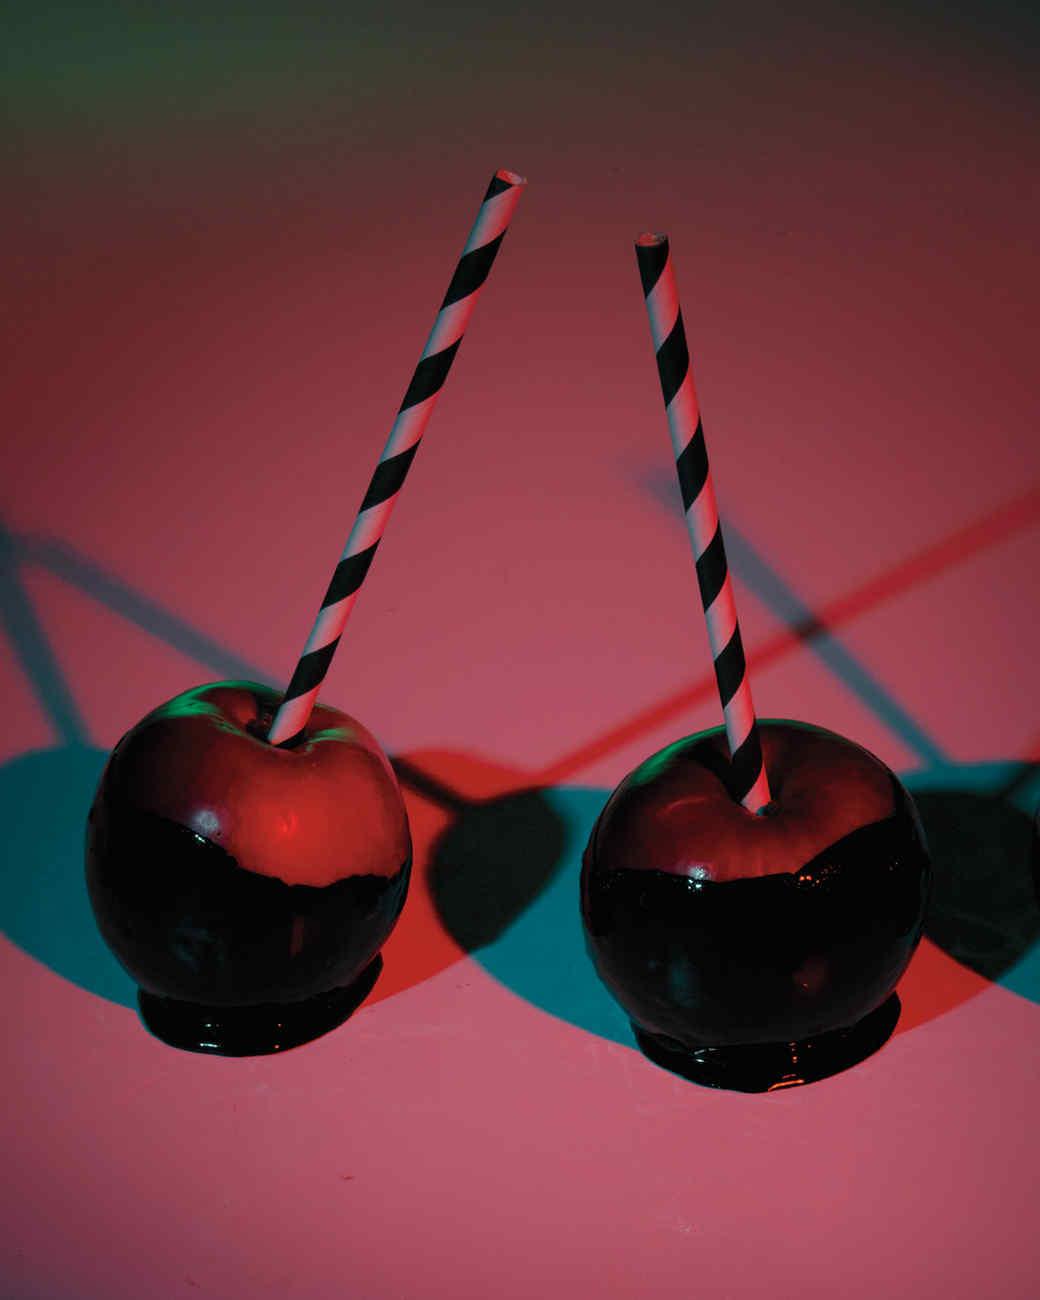 apples-003-md109073.jpg